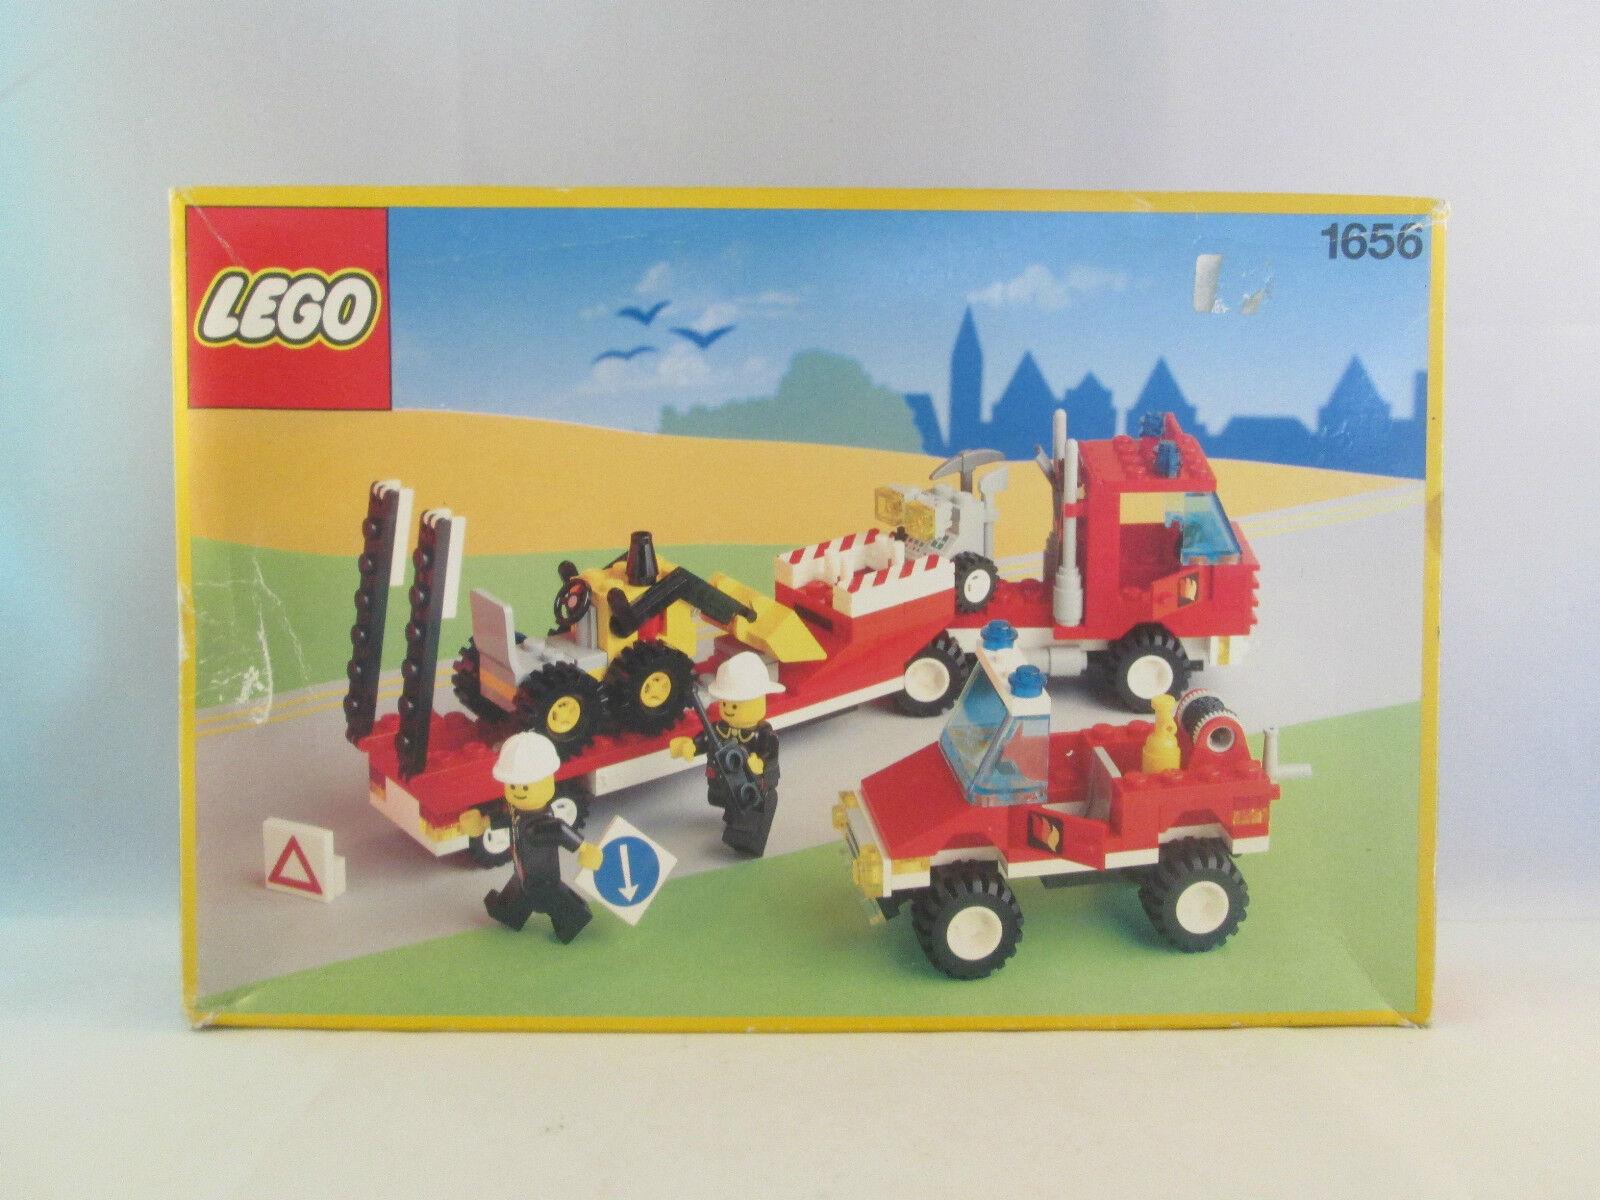 Lego Classic Town - 1656 Evacuation Team Box NEW SEALED